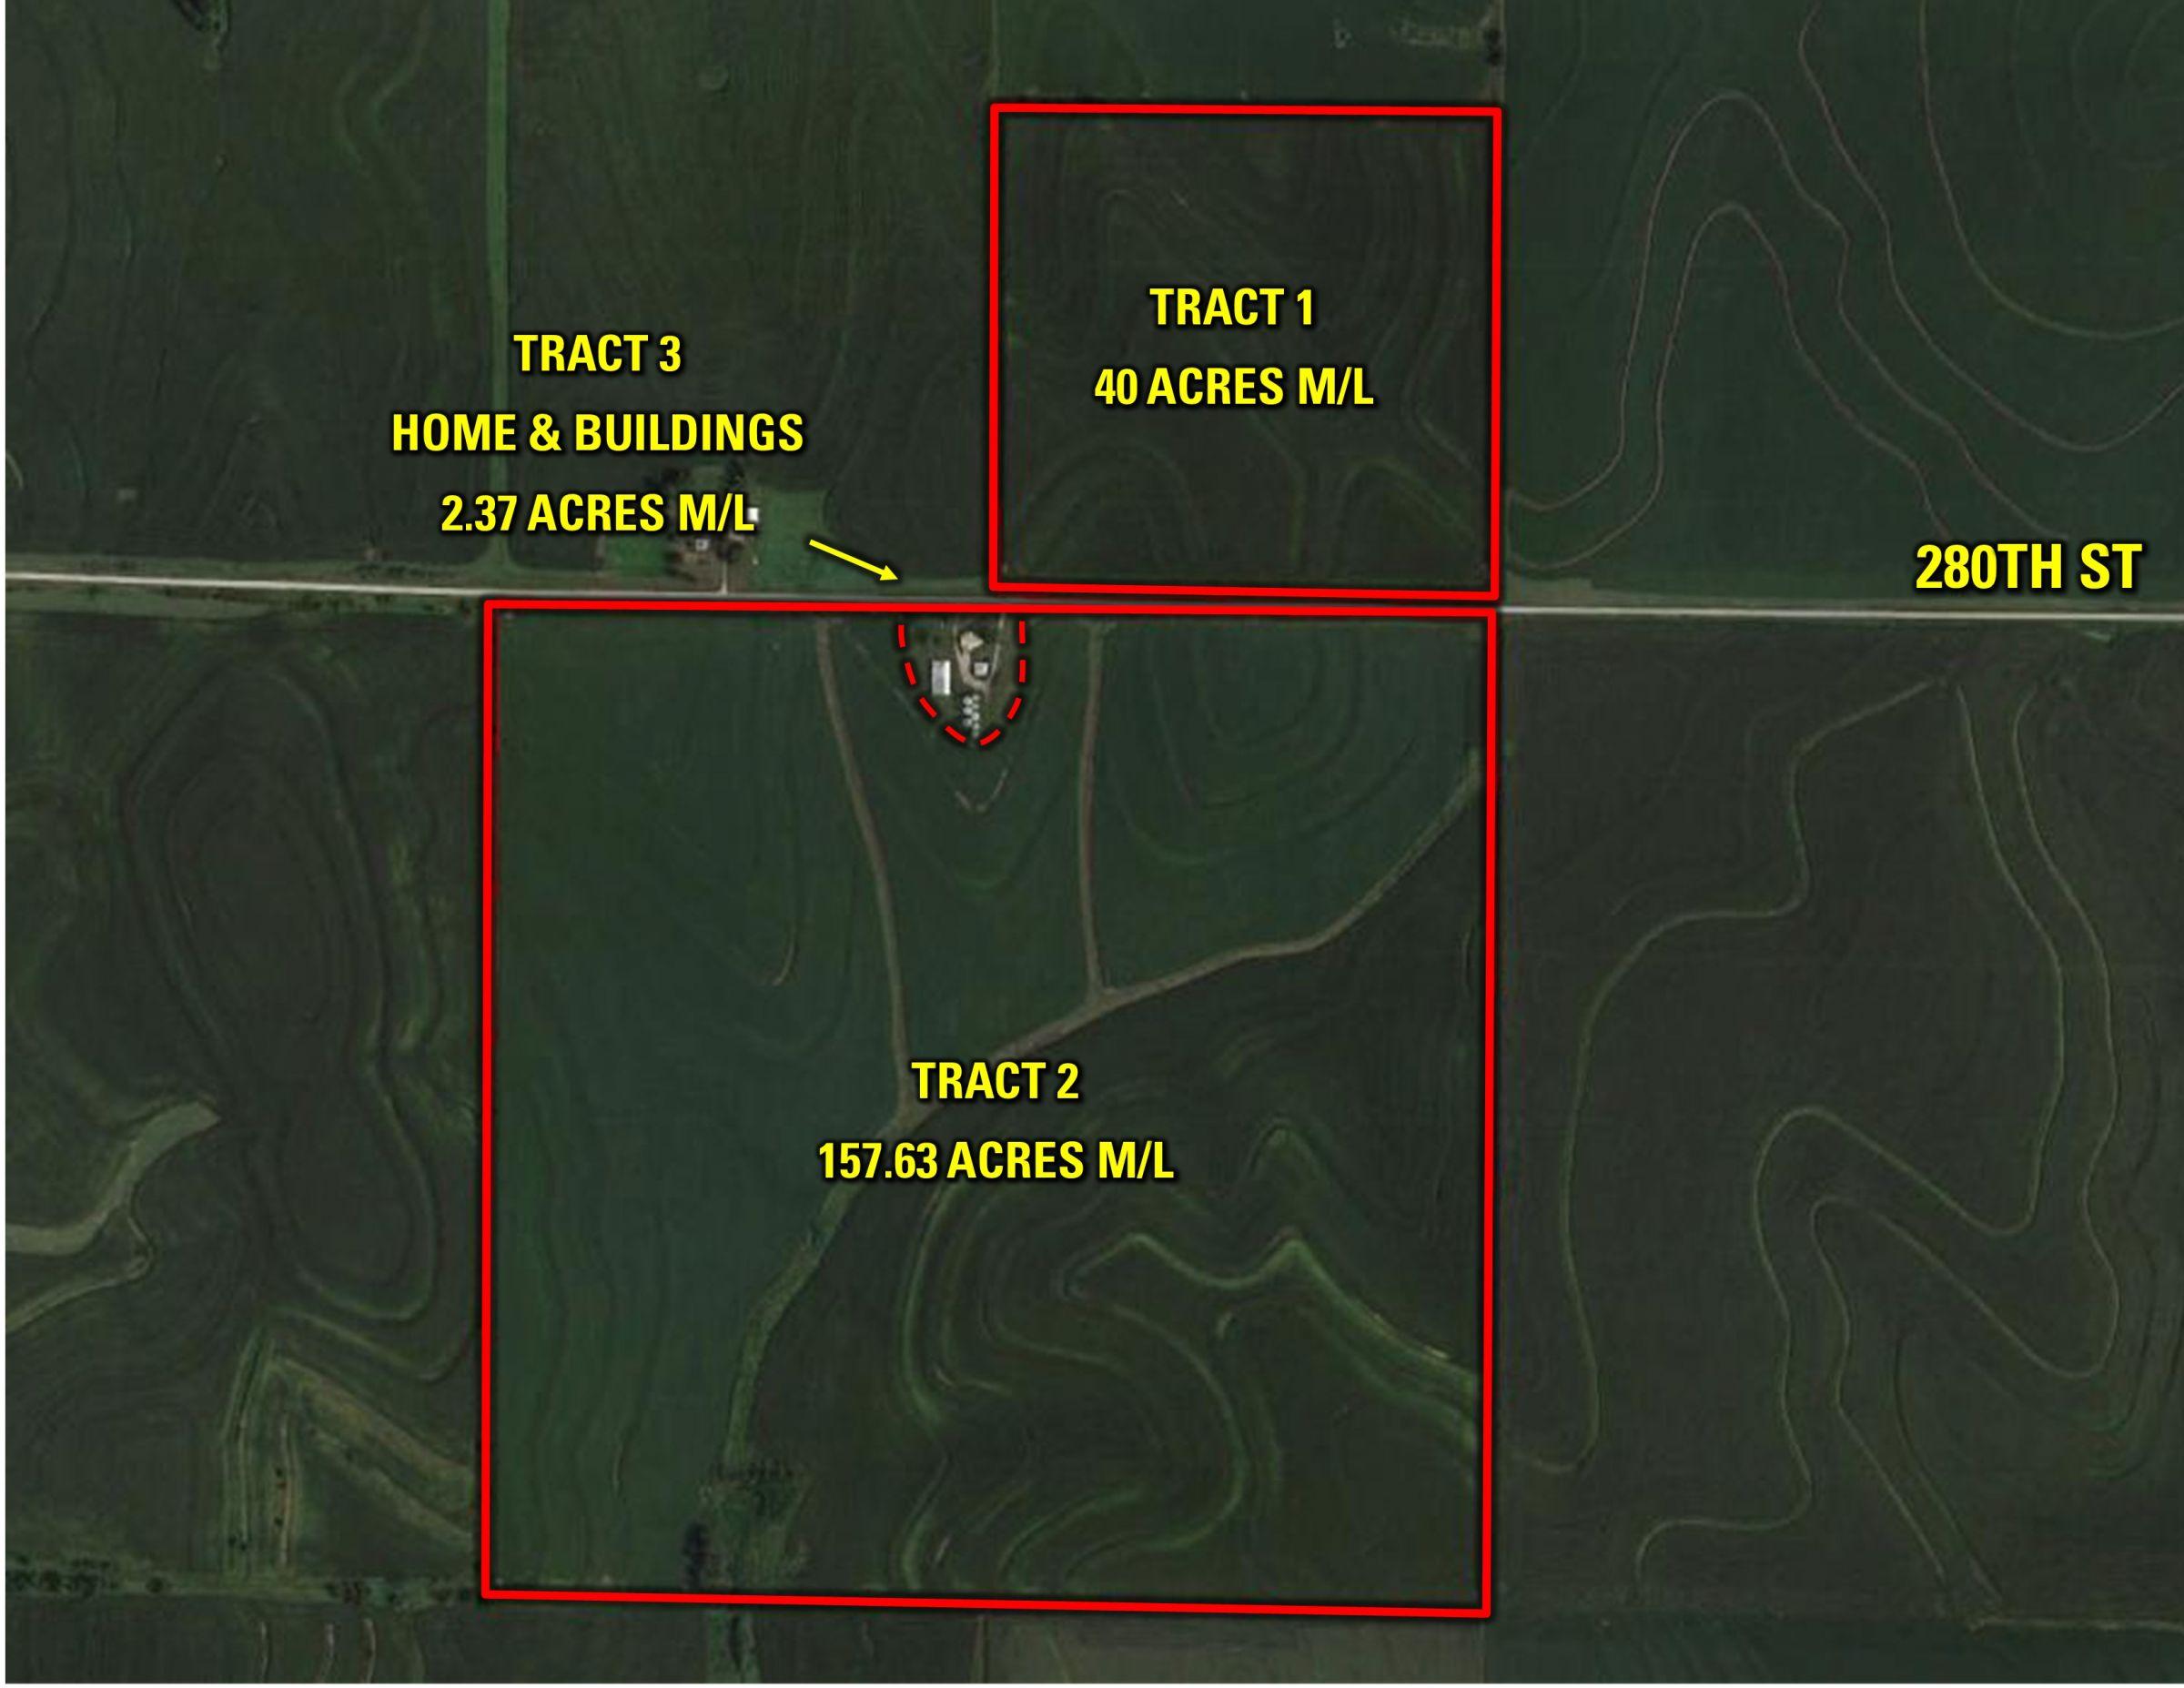 3-3624-280th-st-riverton-51650-0-2021-09-08-205711.jpg